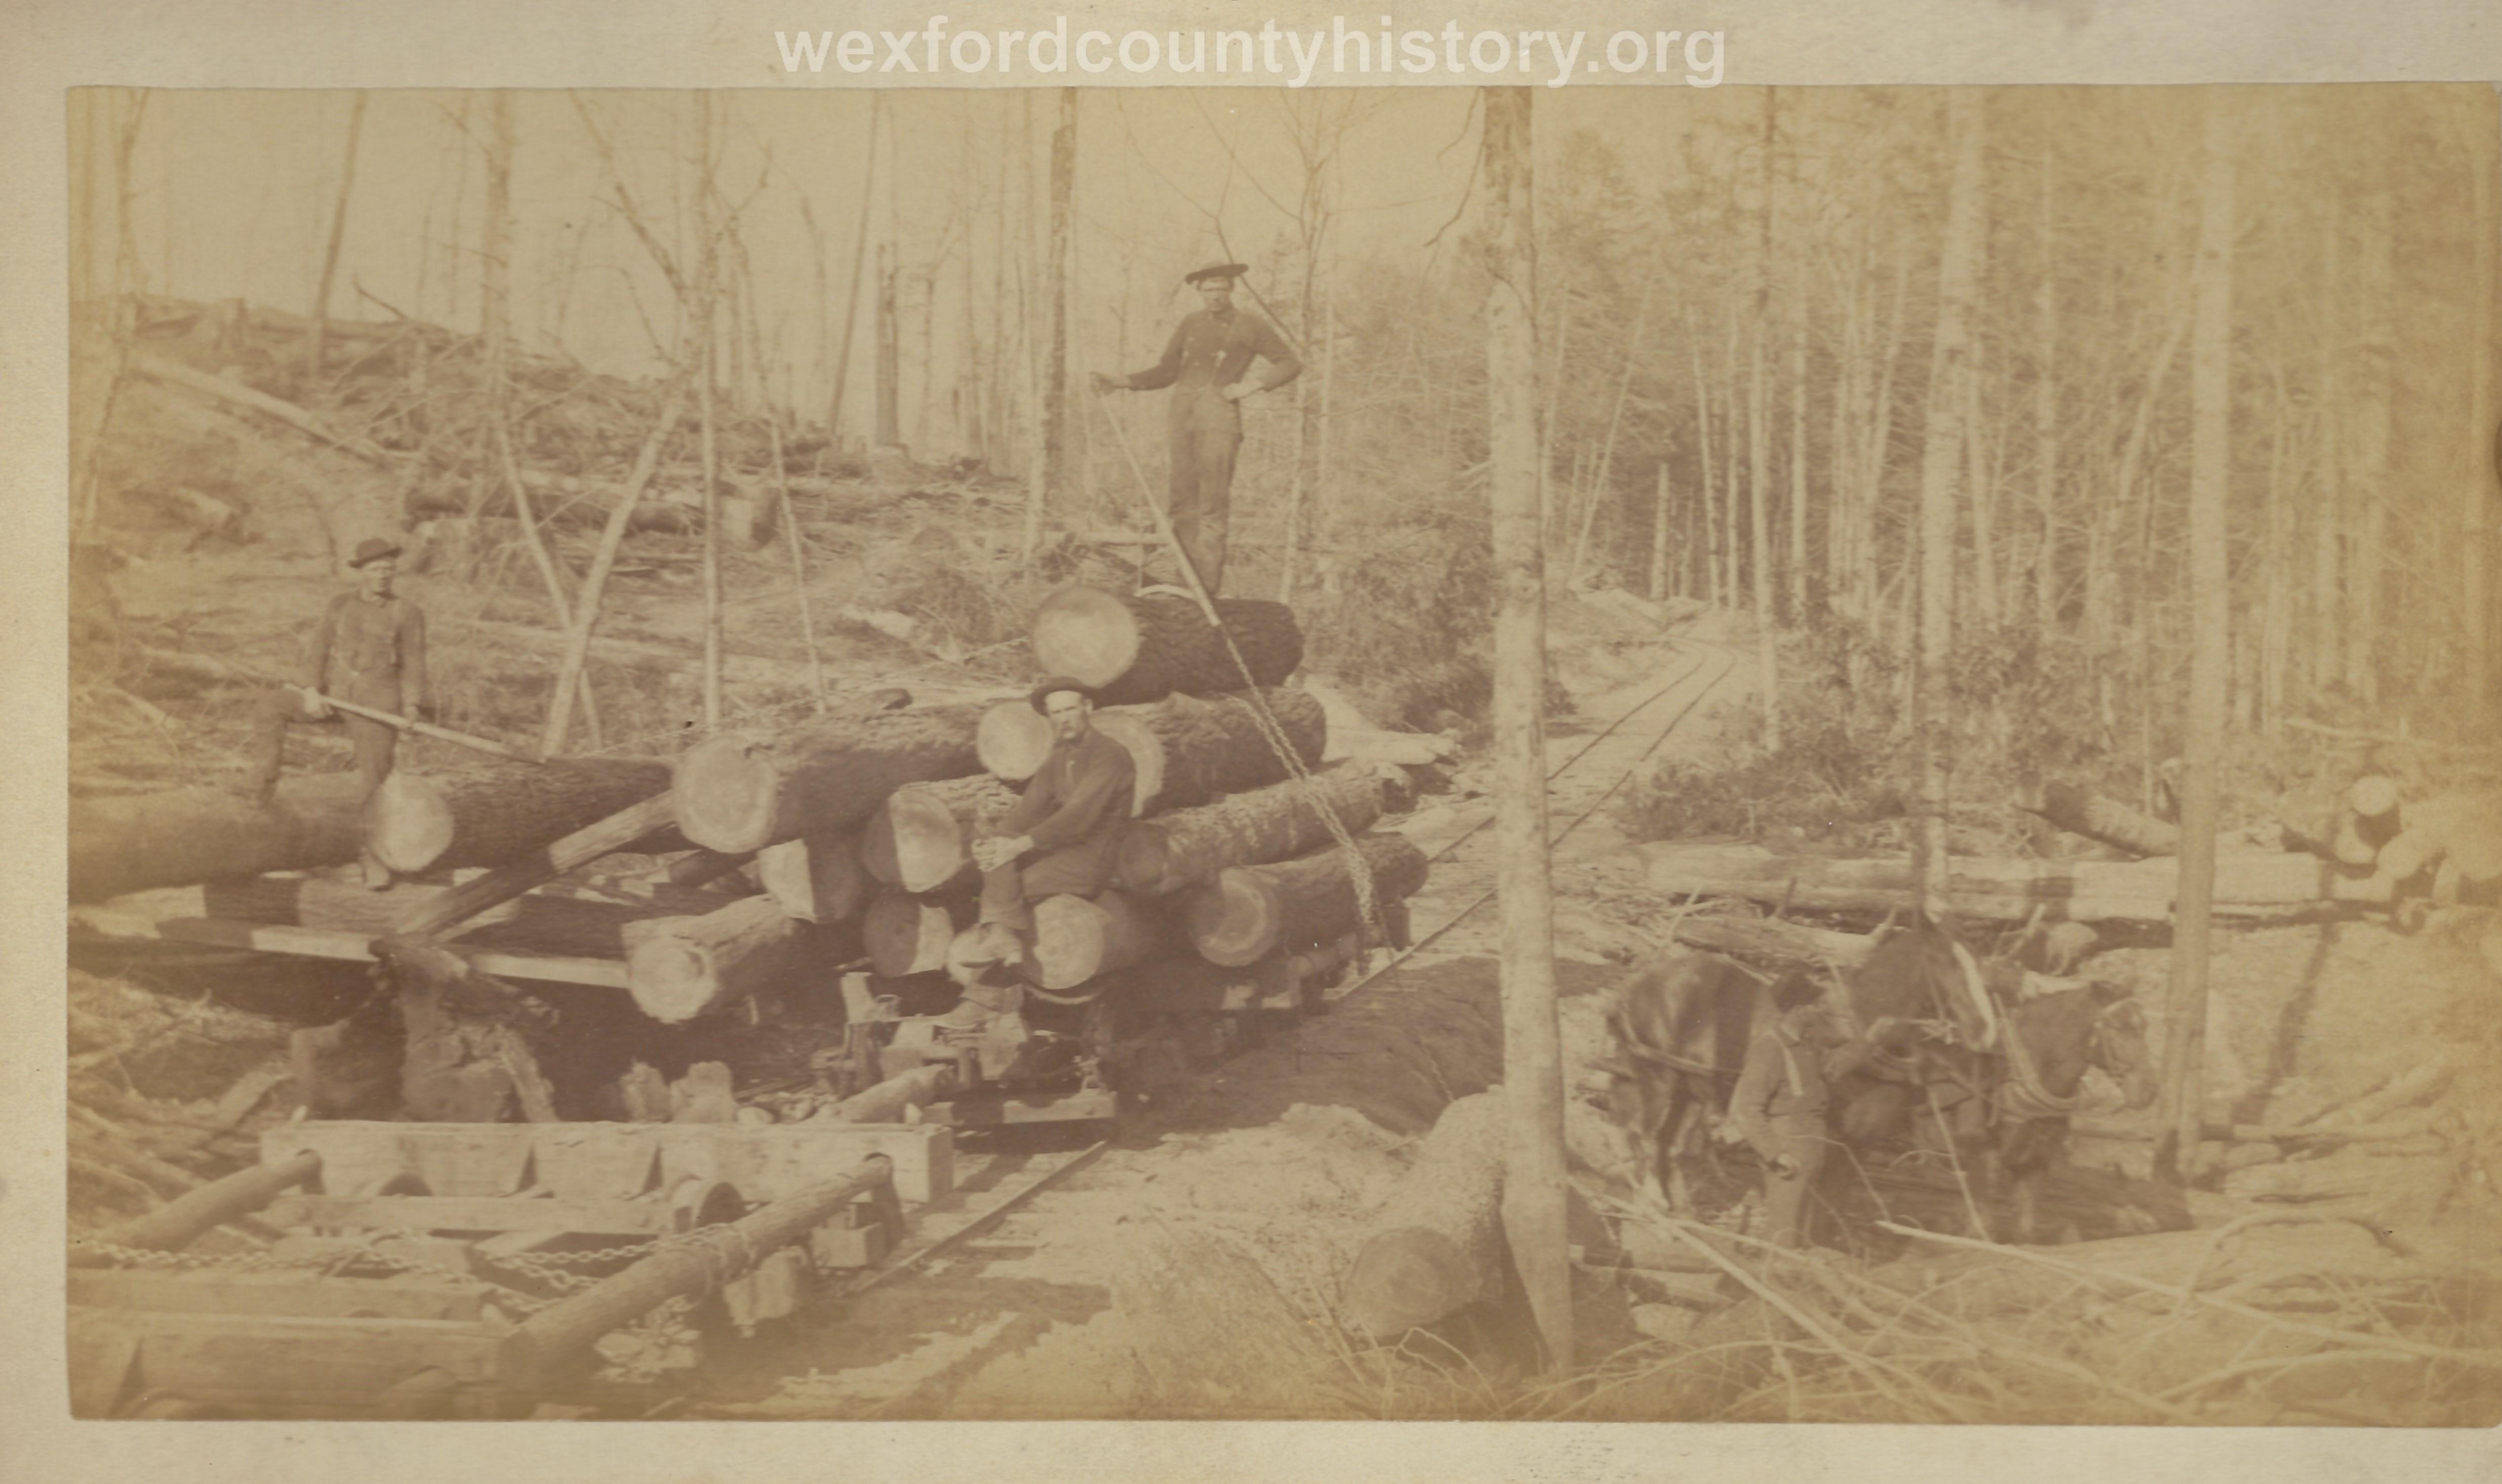 Cadillac-Lumber-Loading-Logs-Onto-Railroad-Car-For-Transport